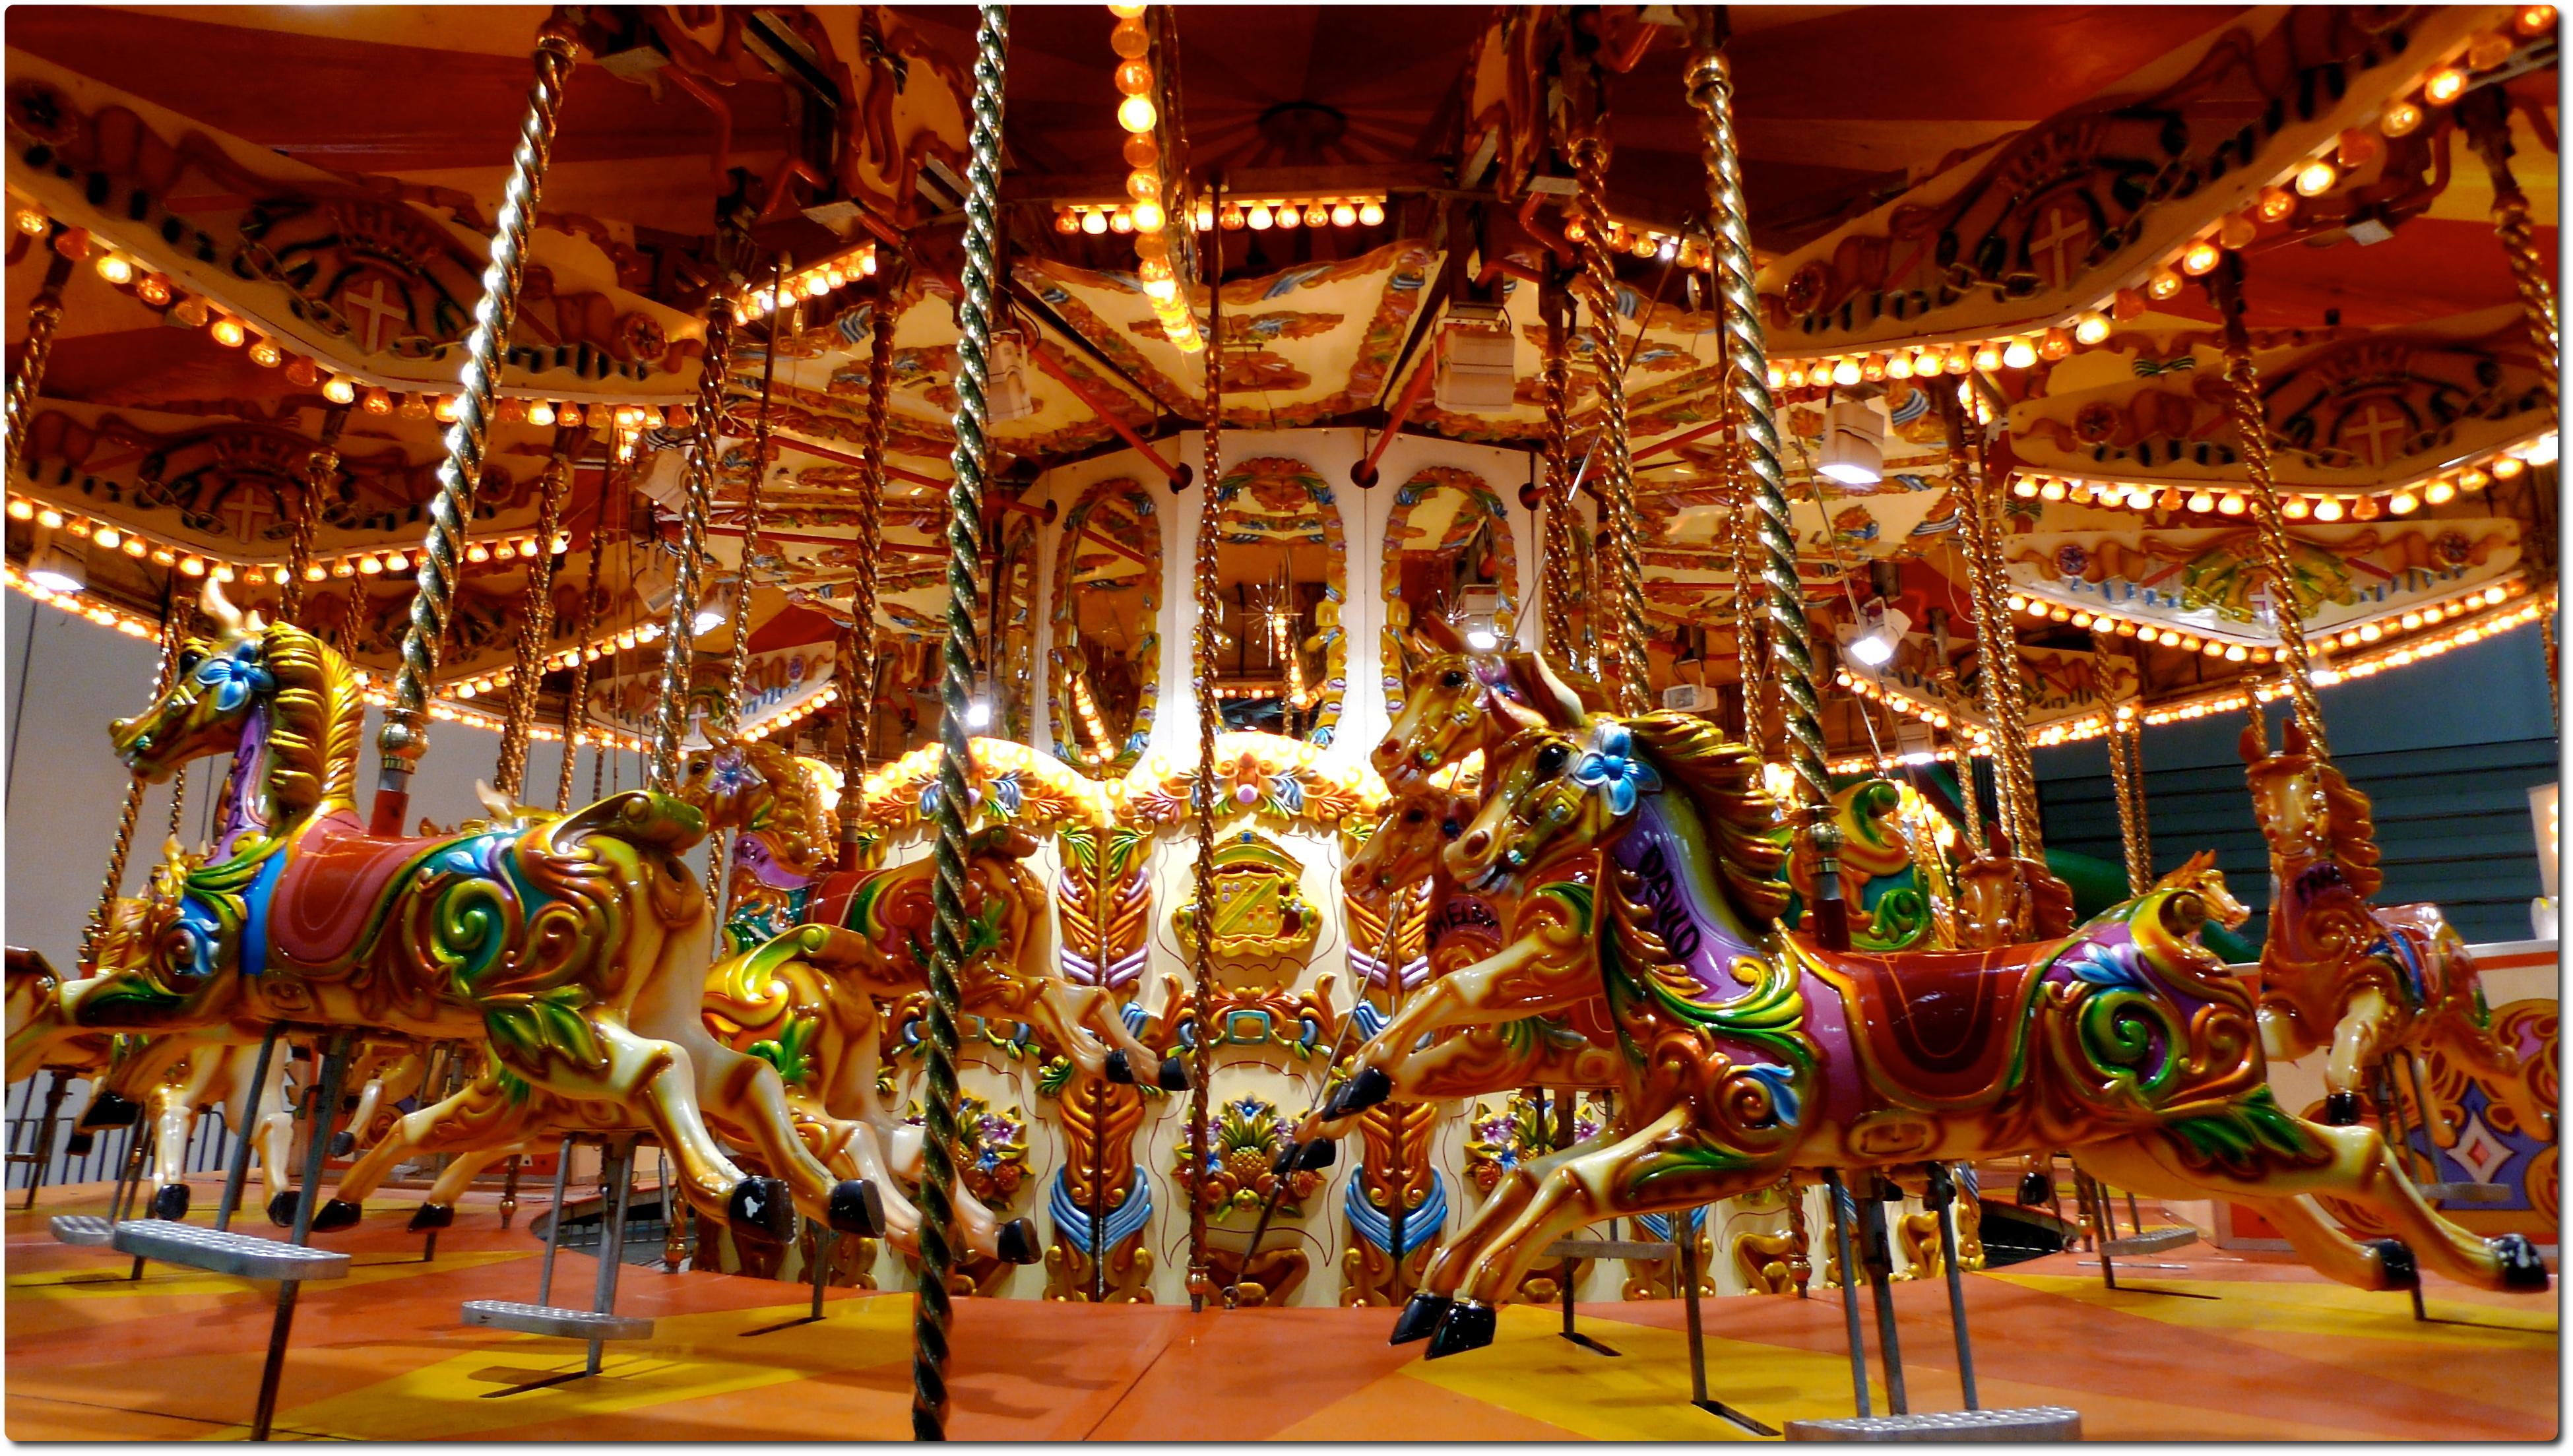 Clipart Horse Carousel